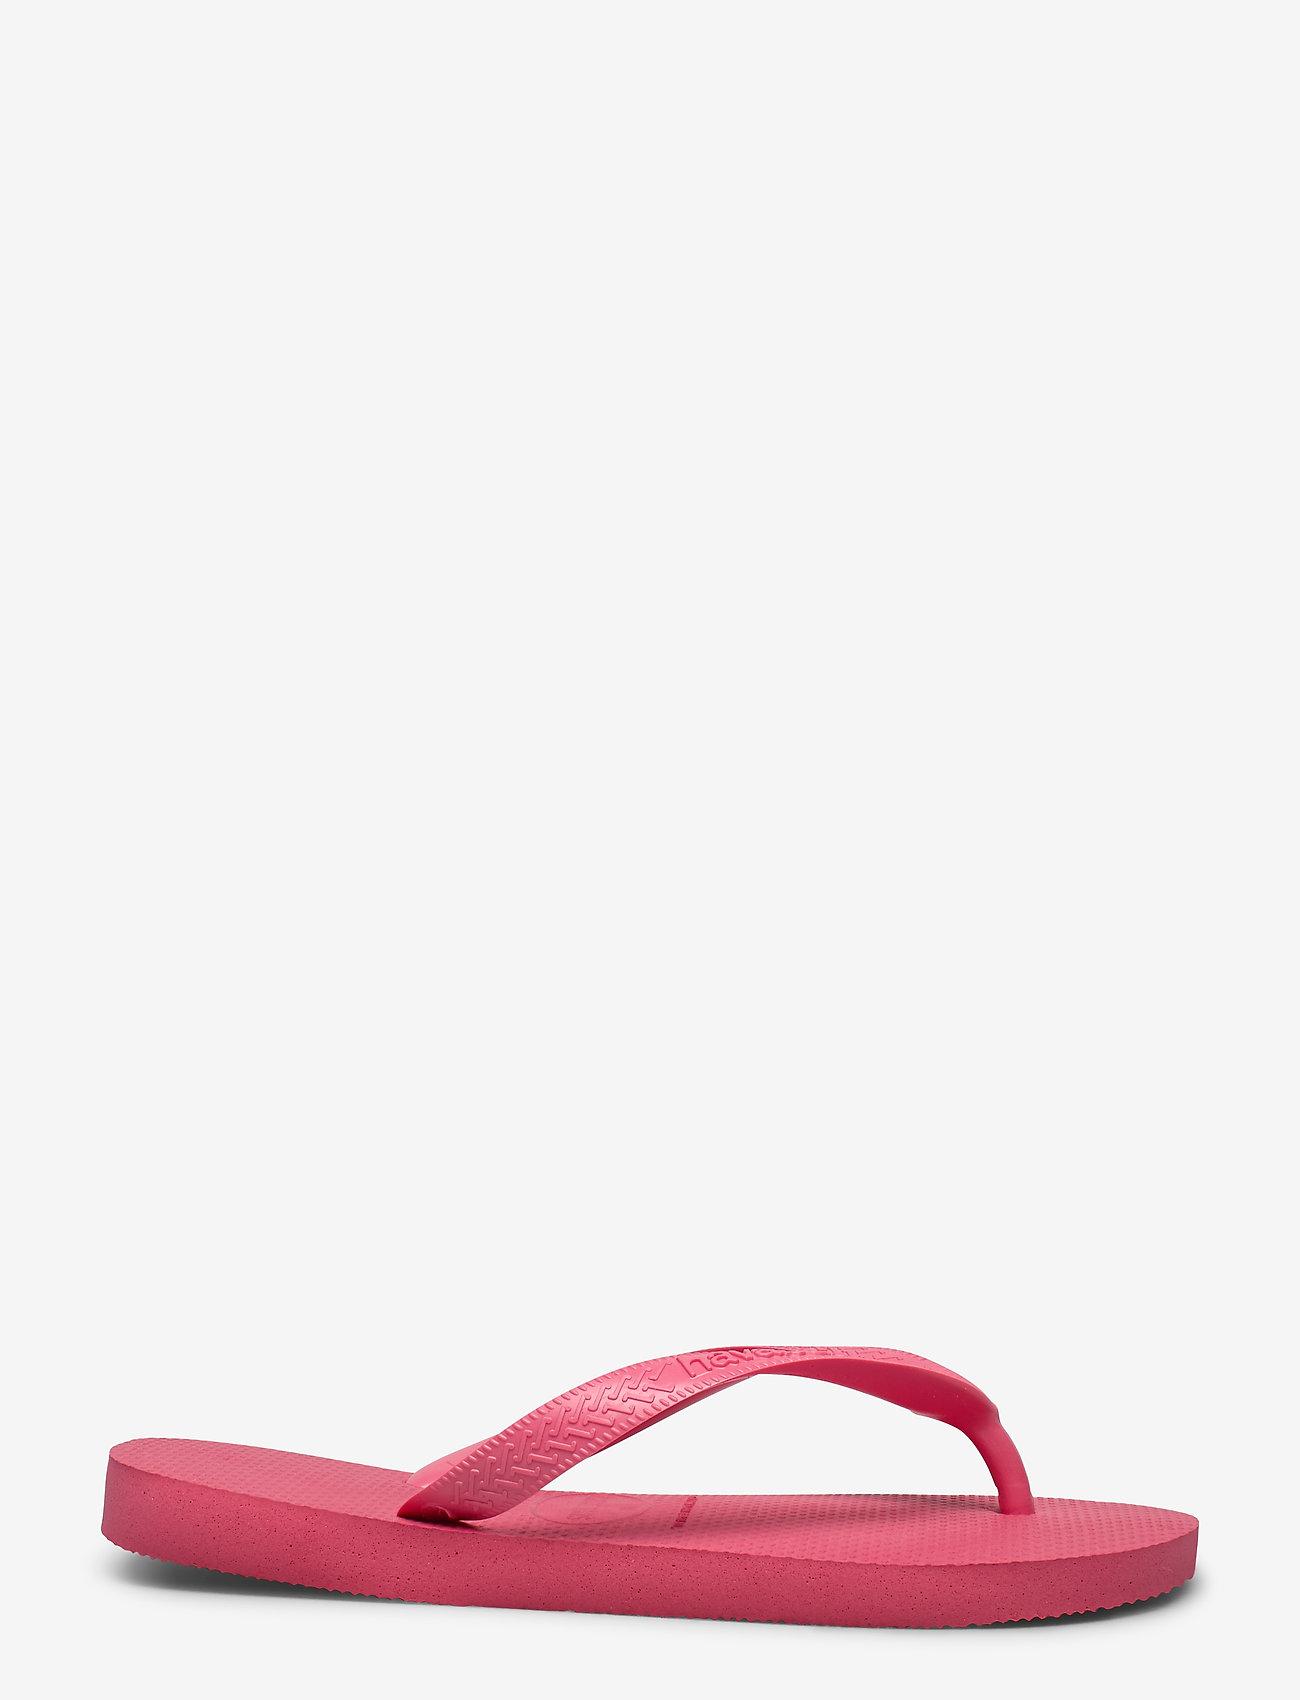 Havaianas - Top - teen slippers - pink porcelain 7600 - 1